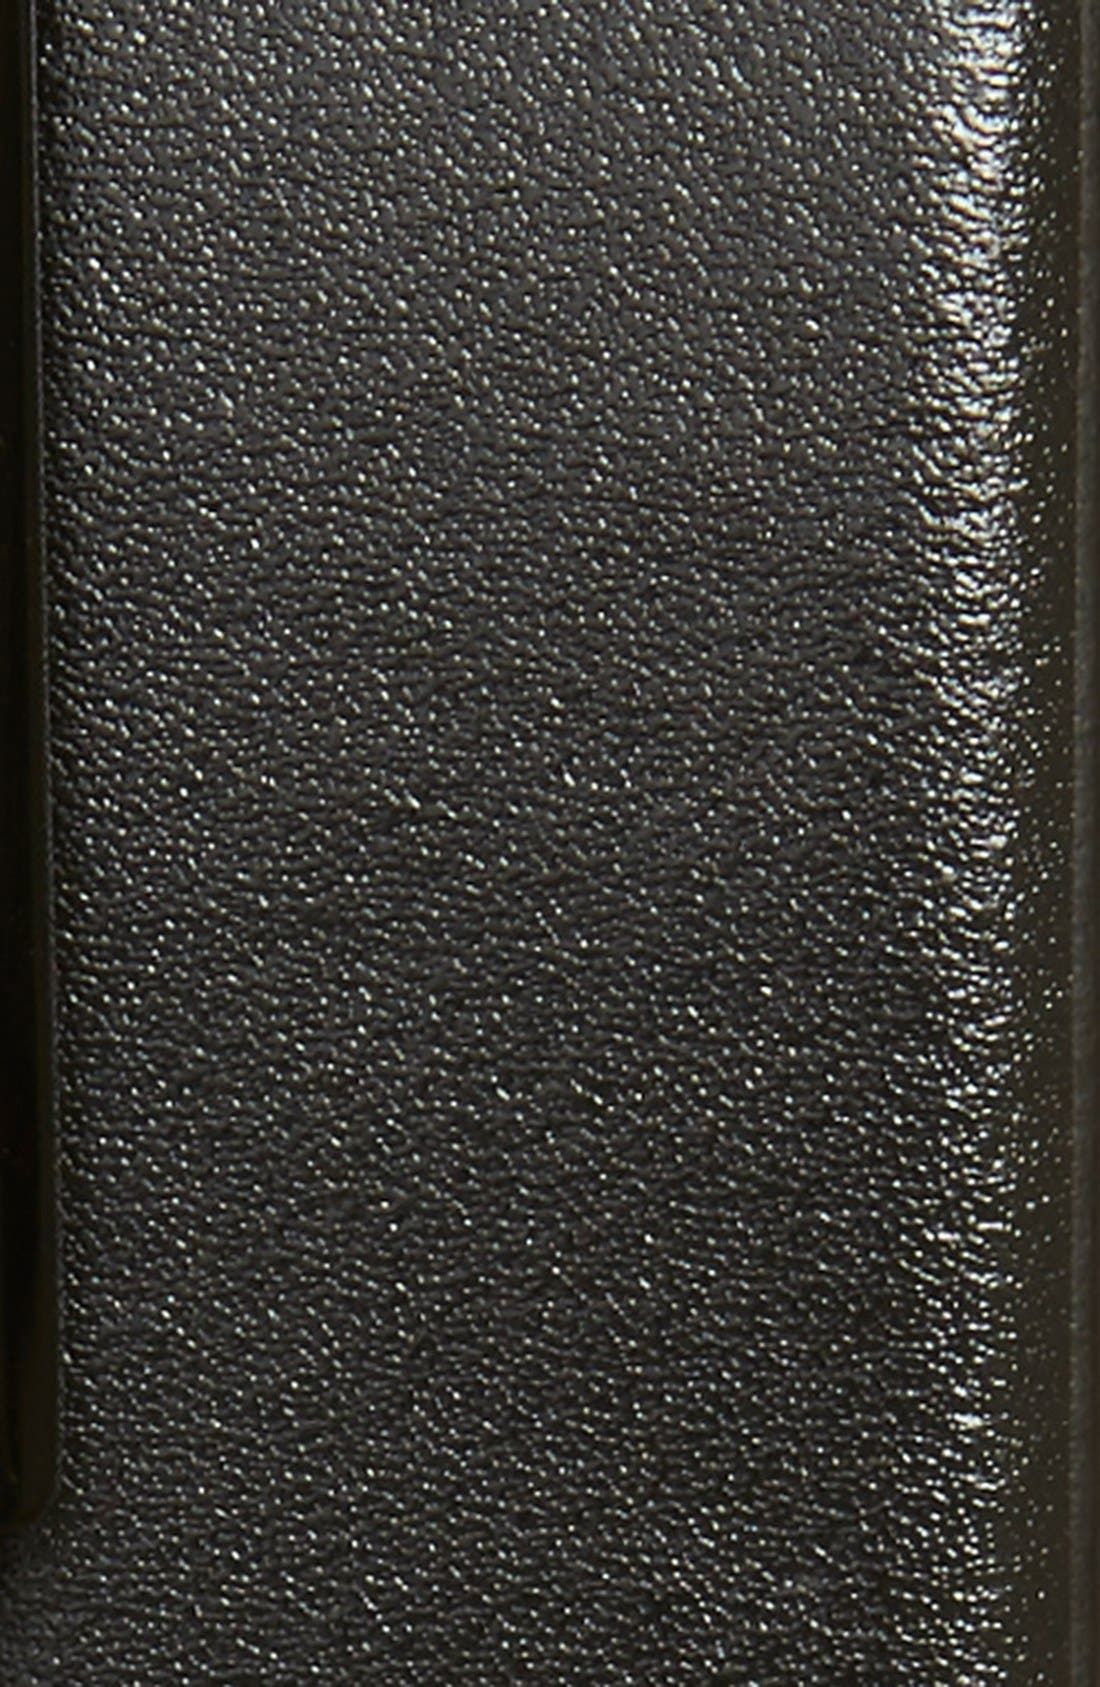 Elvio Reversible Leather Belt,                             Alternate thumbnail 3, color,                             Black/ Grey